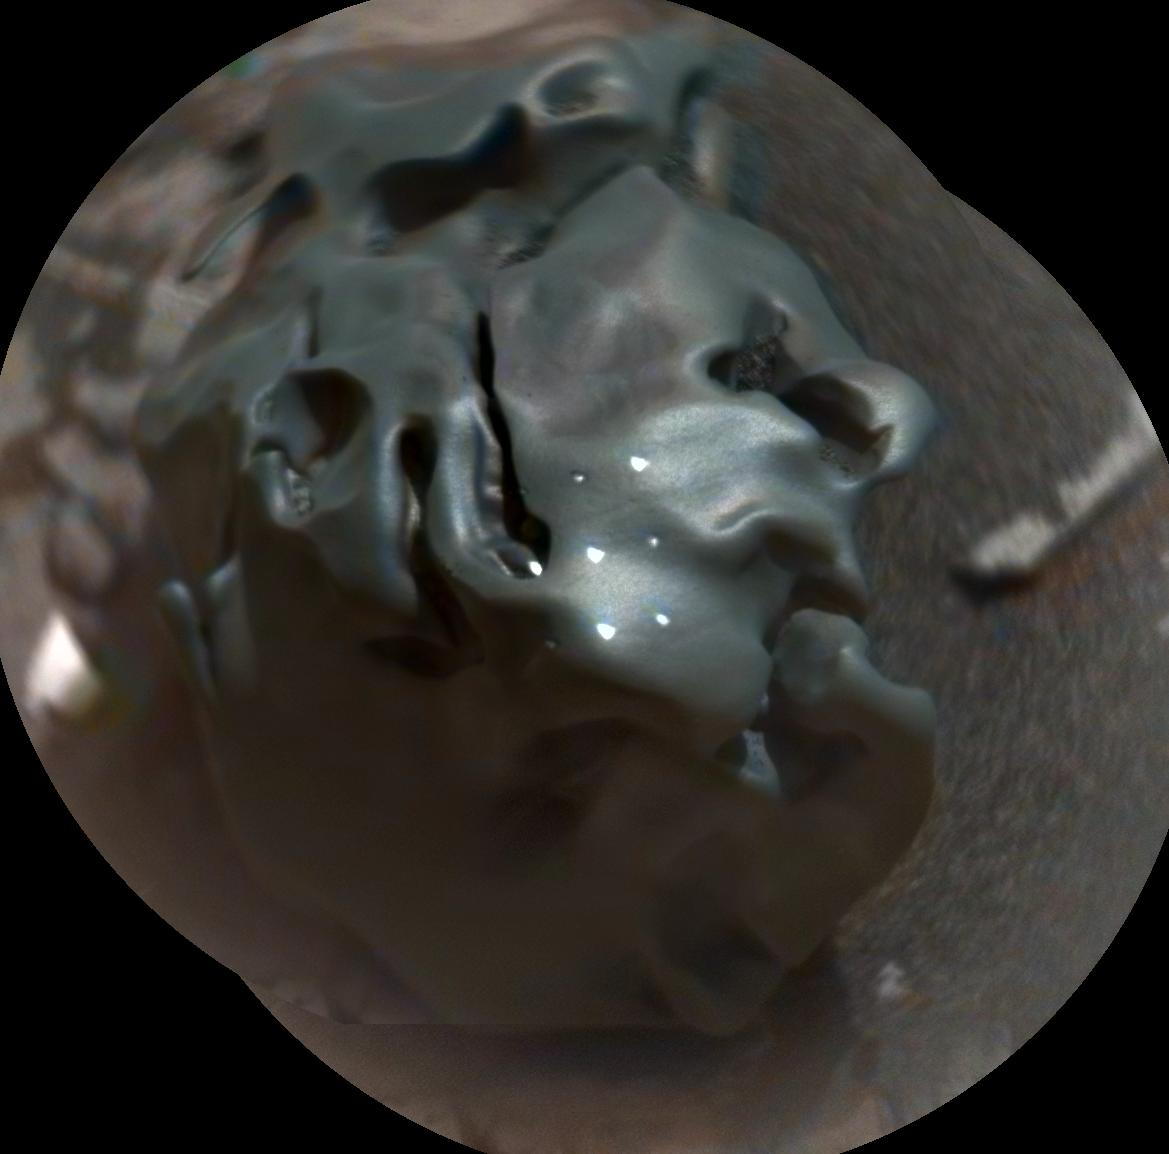 Curiosity Mars rover checks odd-looking iron meteorite